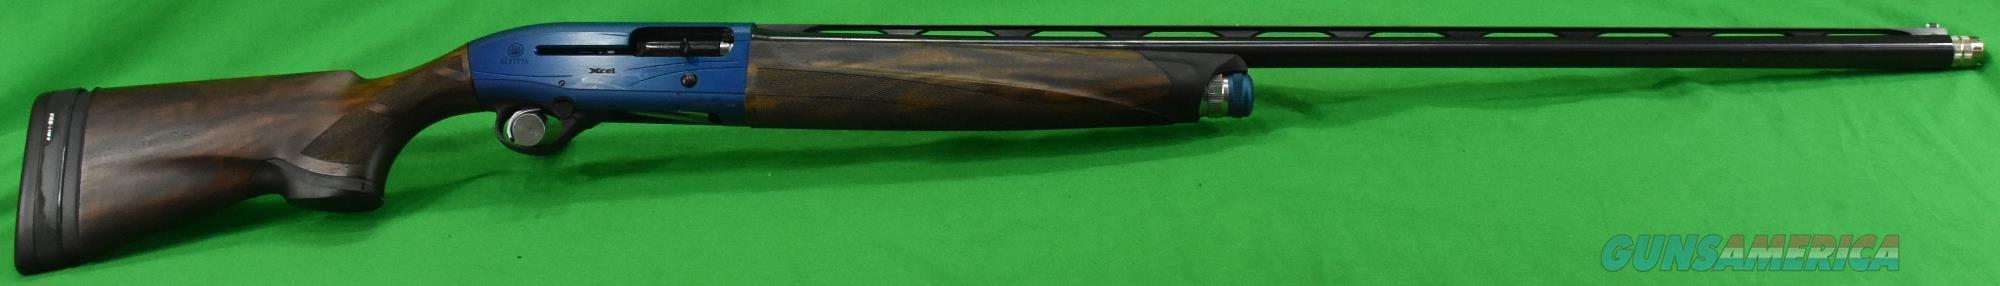 A400 Xcel Sporting KO 12Ga 32-3In  J40CK12  Guns > Shotguns > Beretta Shotguns > Autoloaders > Trap/Skeet